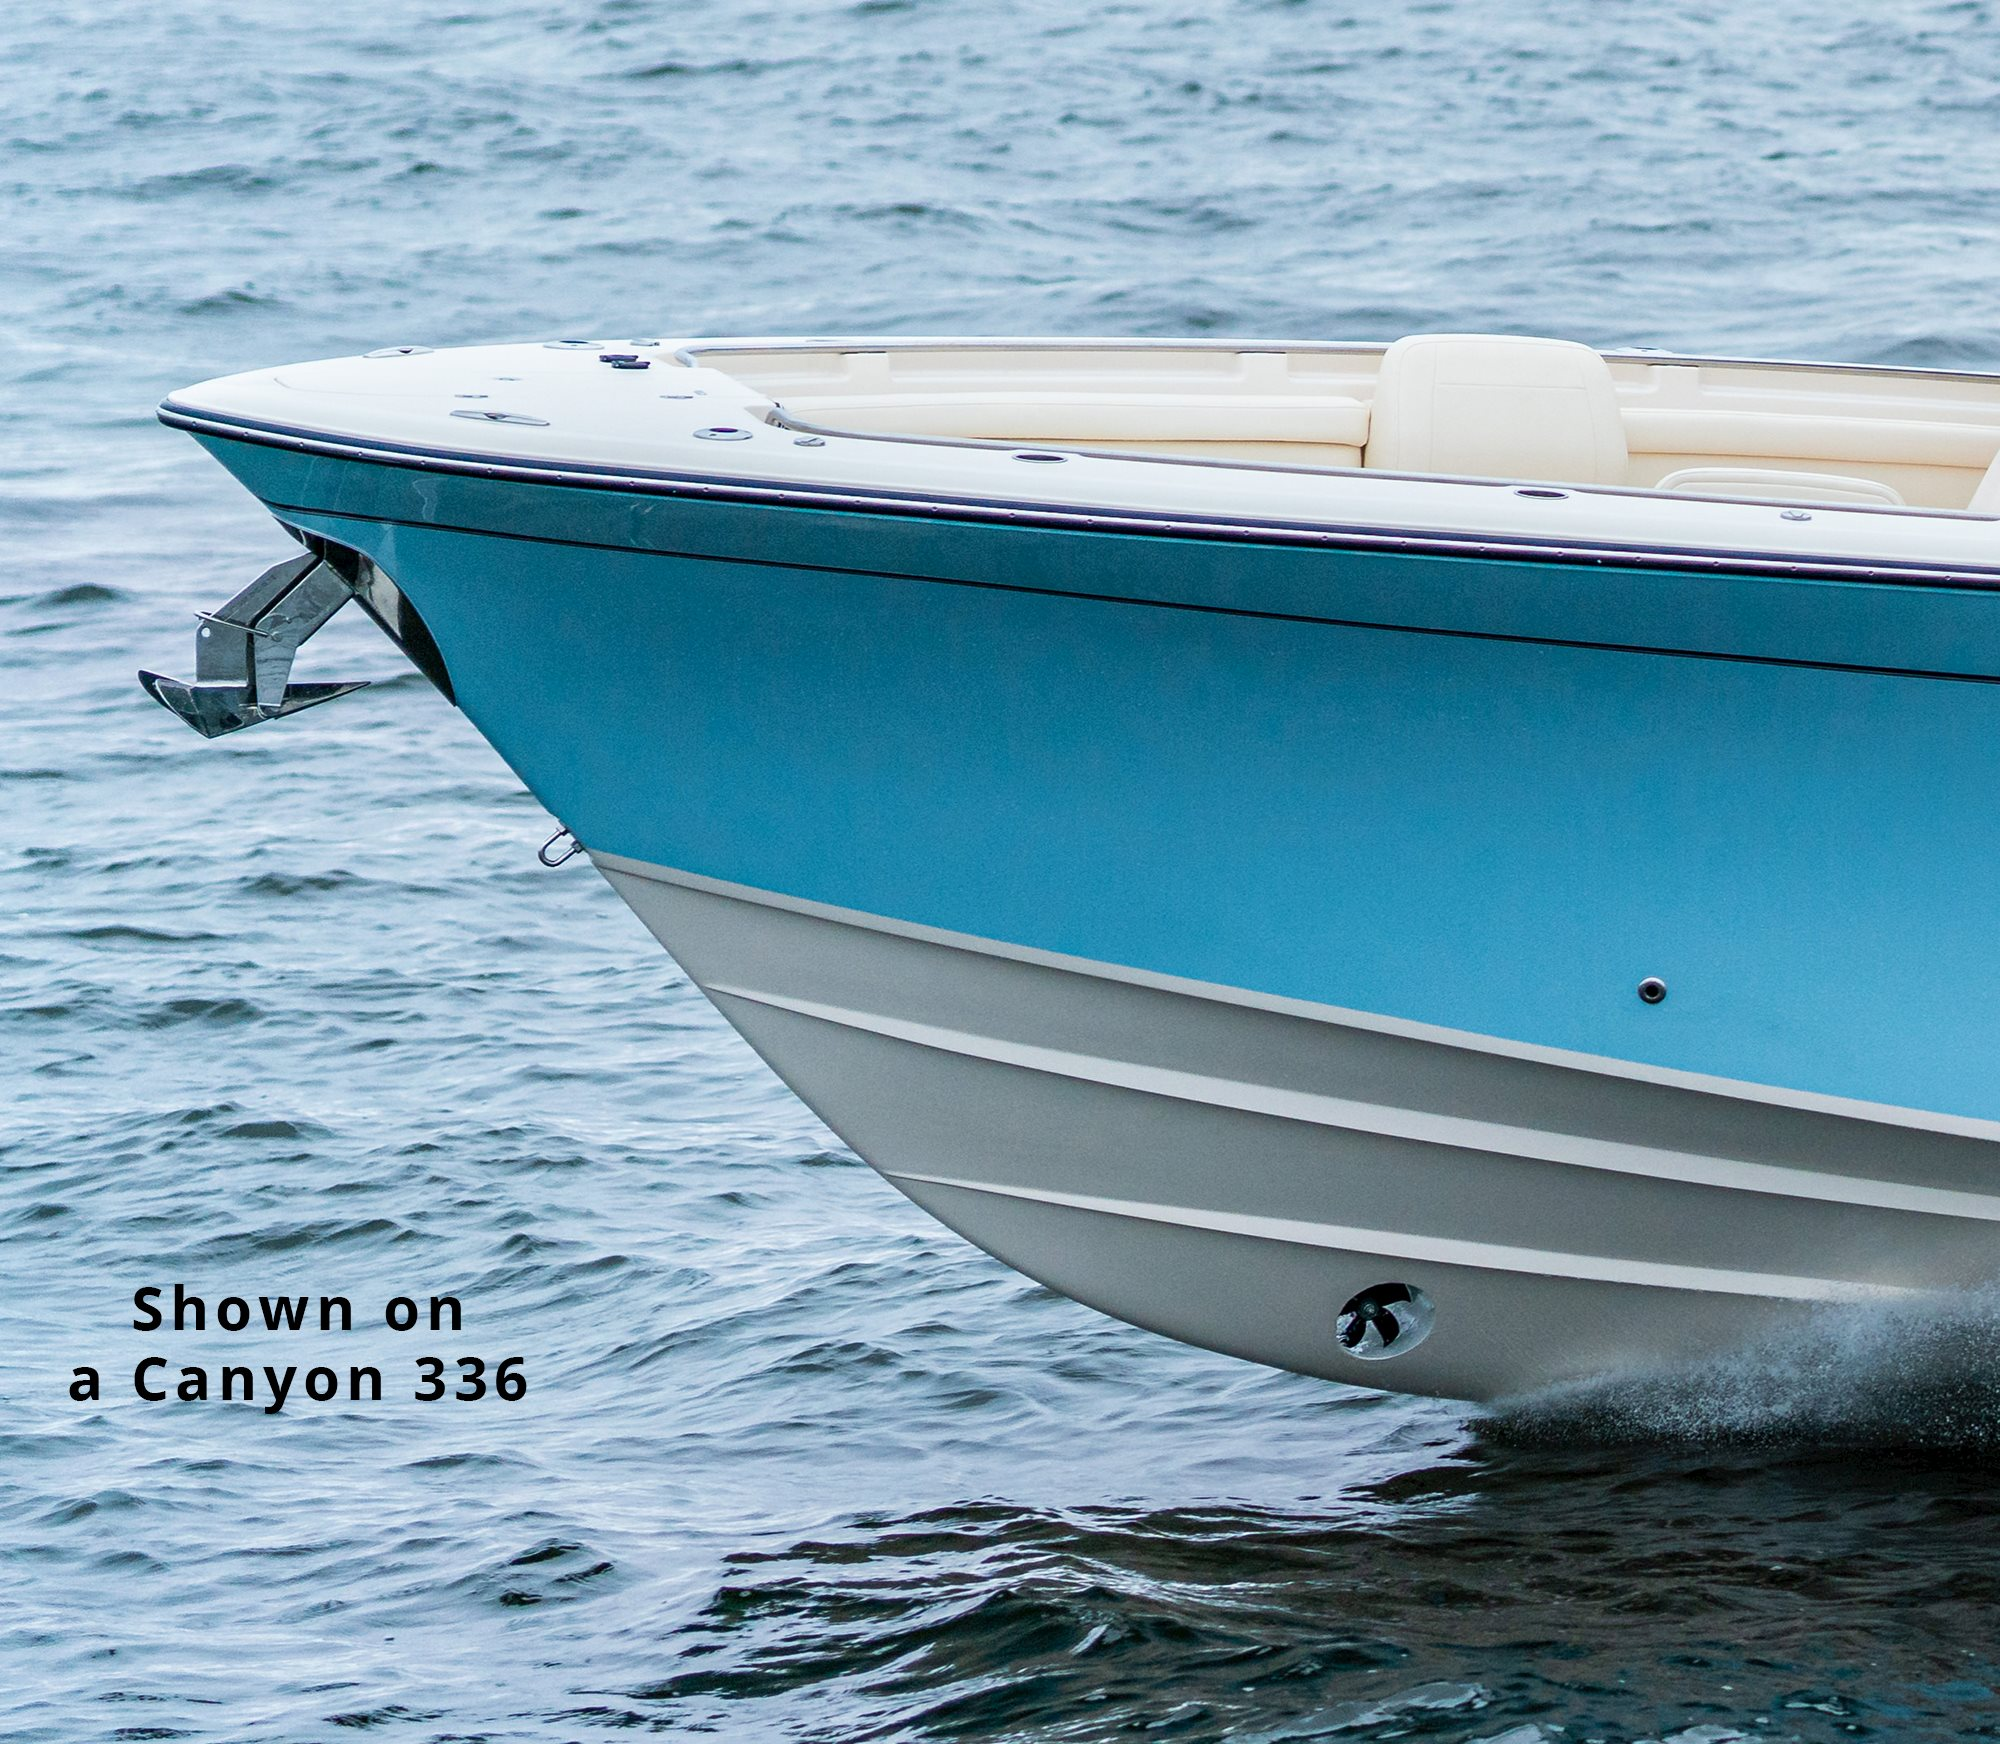 Grady-White Marlin 300 30 foot Walkaround Cabin Boat Bow Thruster